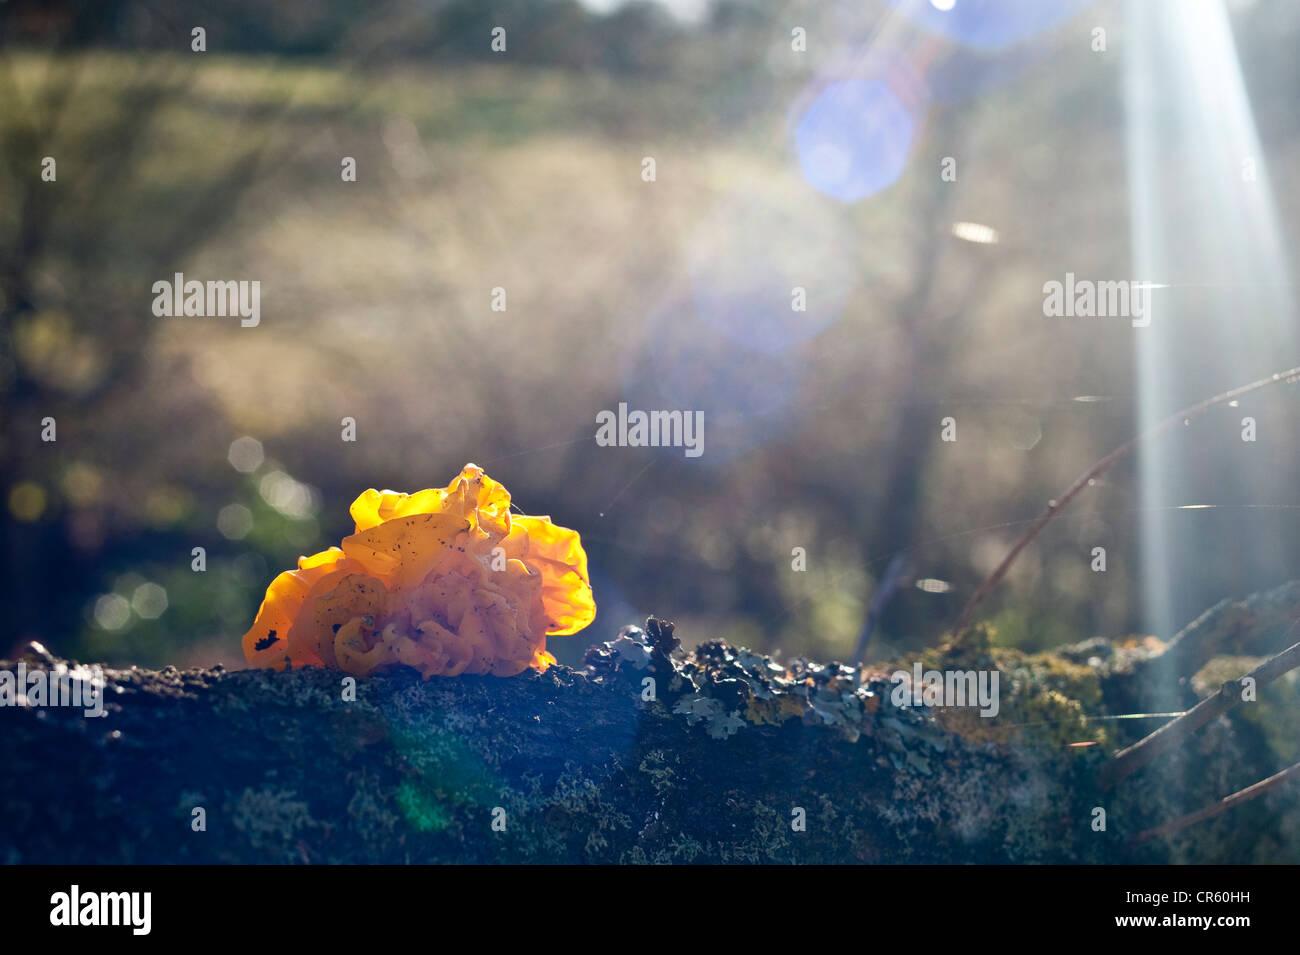 Autumn day a photograph of a Tremella Mesenterica, common term Yellow brain fungus - Stock Image